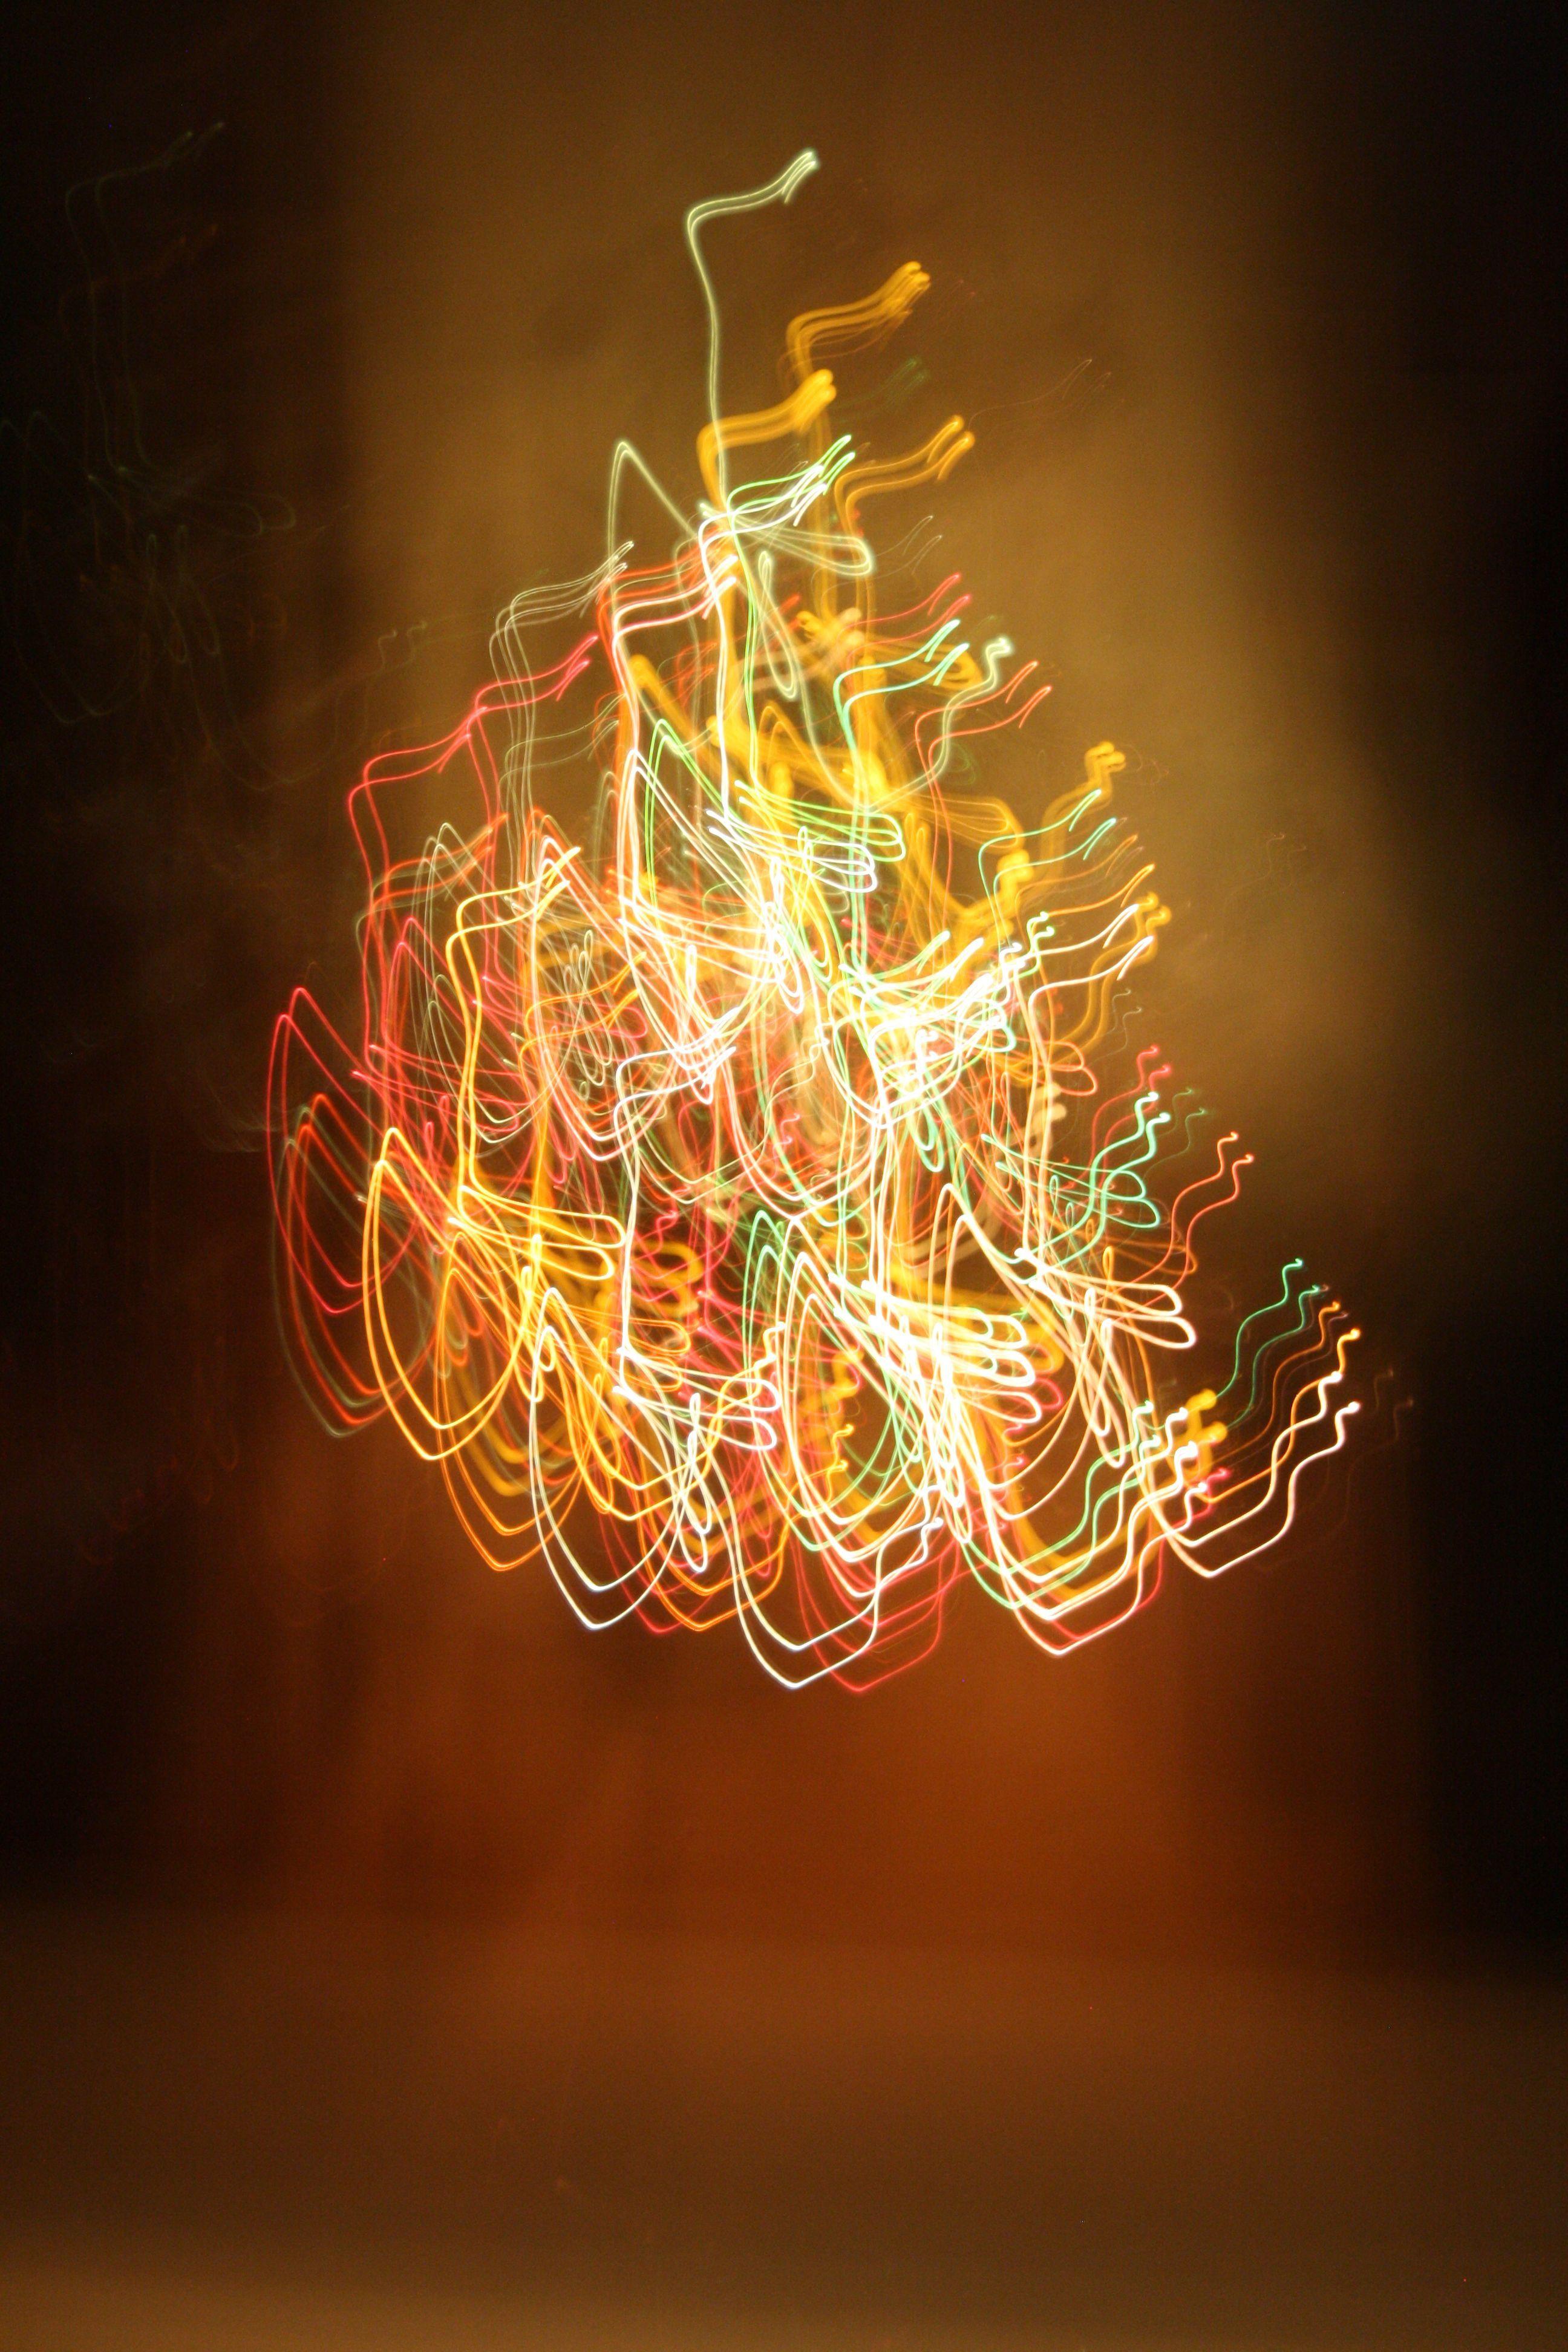 Lichtkunst light art christmas tree 2012 light pinterest lichtkunst light art christmas tree 2012 sciox Images